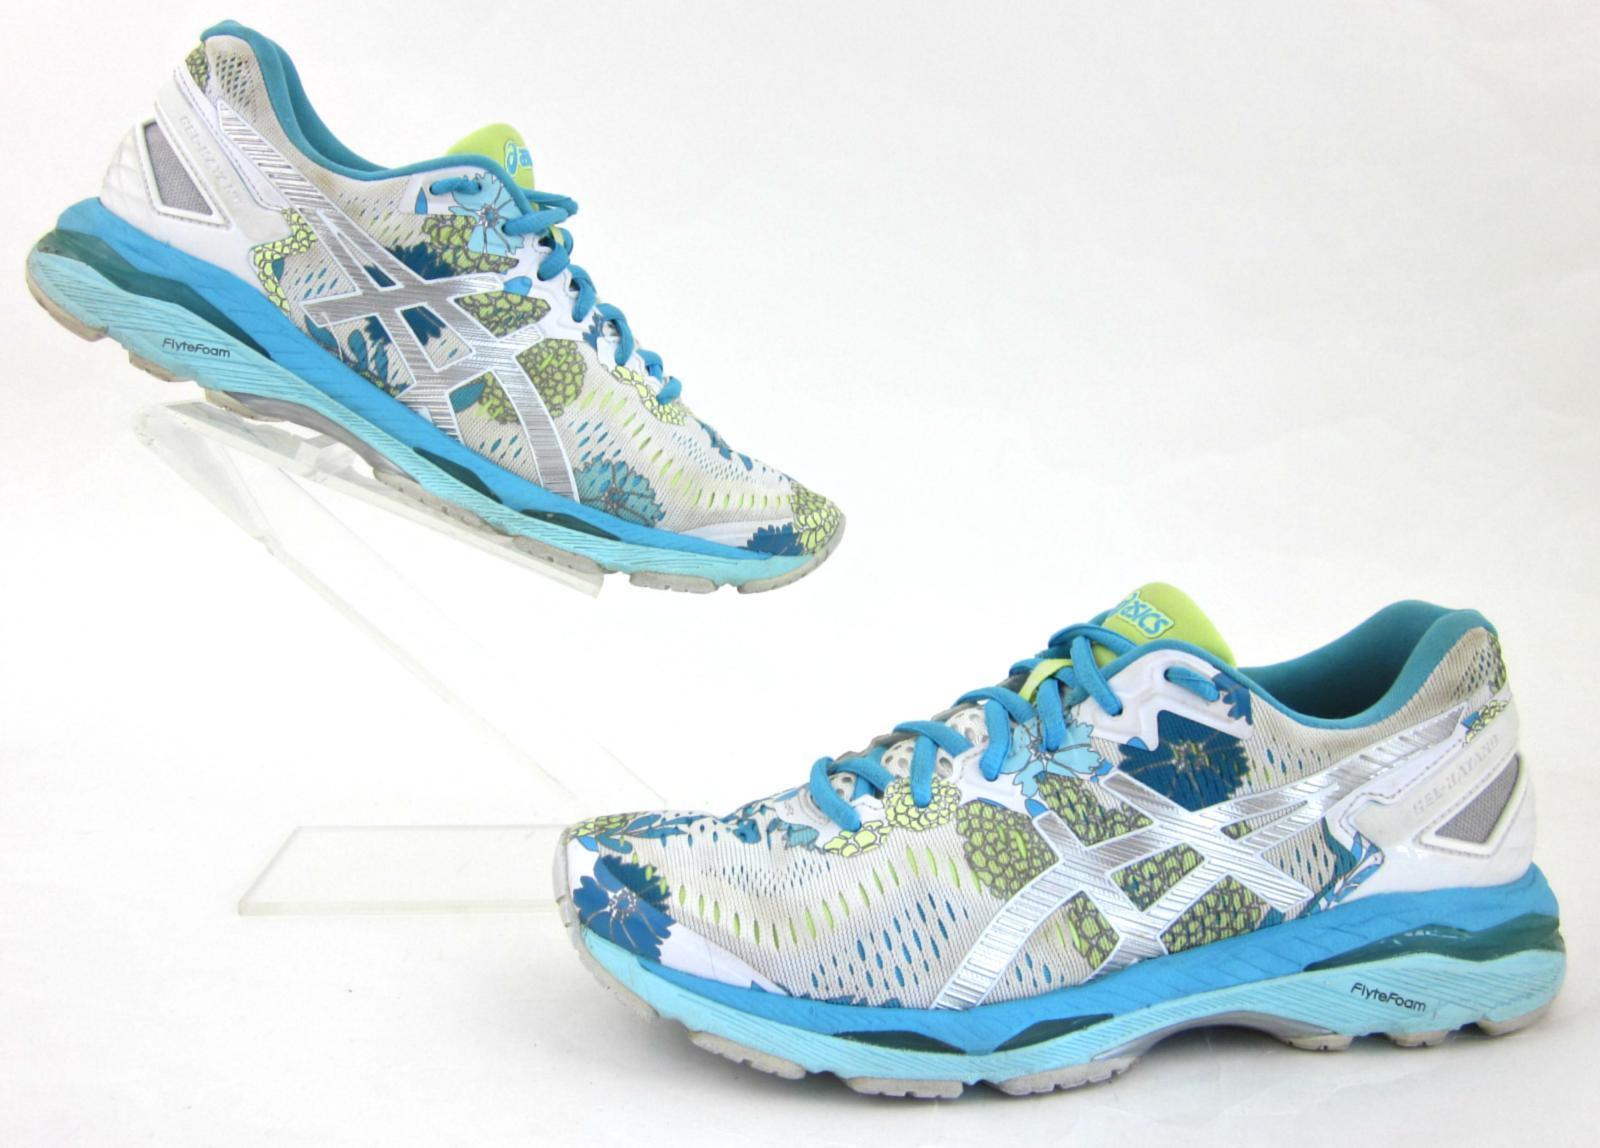 Asics Gel-Kayano 23 LTD Floral Edition Running shoes White Silver Aquarium 8.5